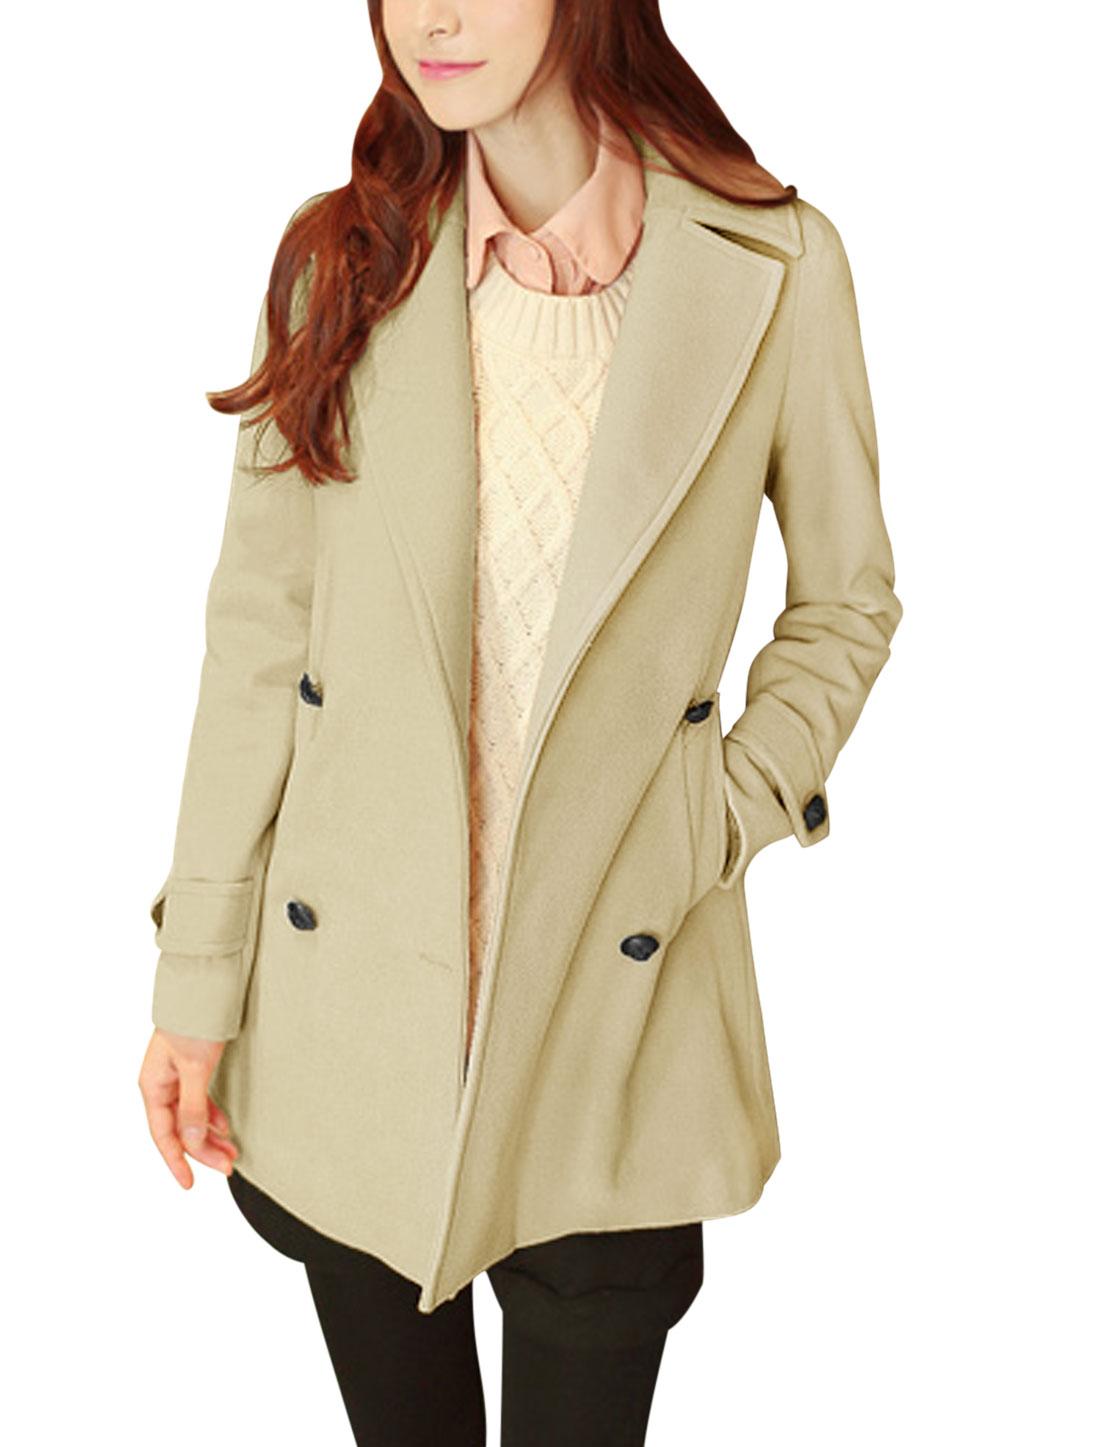 Women Notched Lapel Button Closure Stylish Worsted Coat Beige M